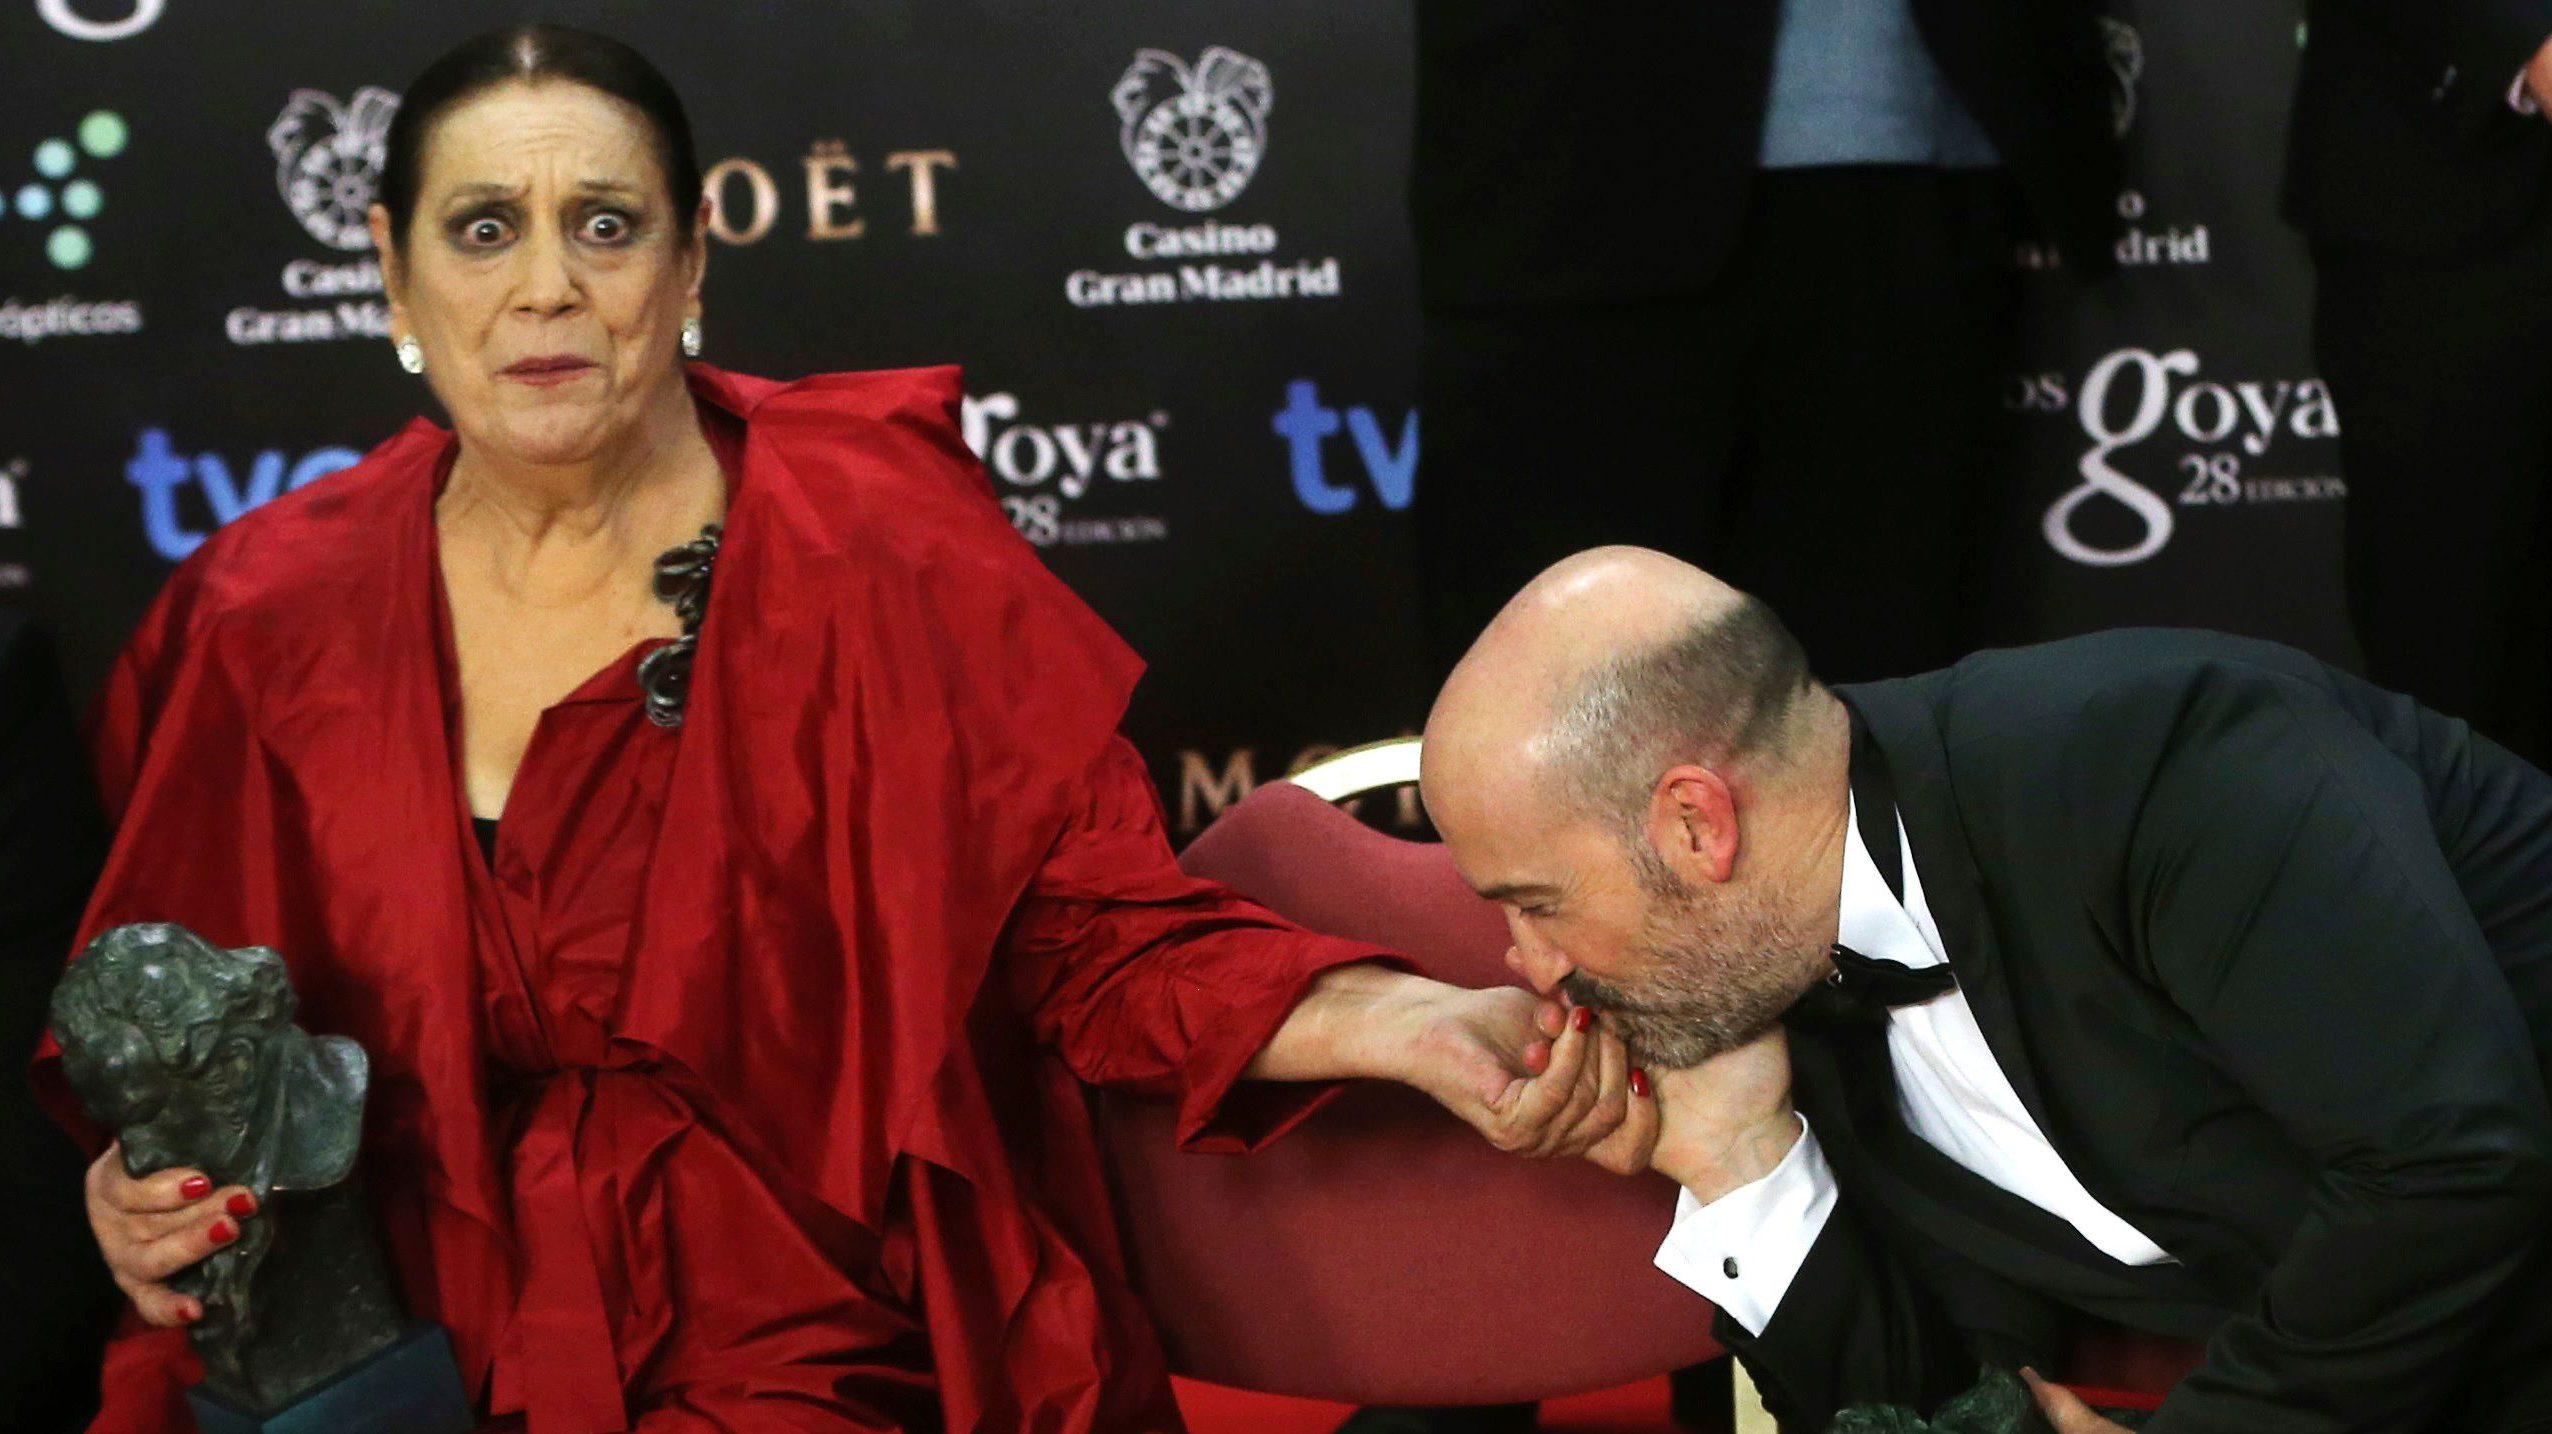 Actor Javier Camara, winner of the Best Leading Actor award, kisses the hand of actress Terele Pavez.